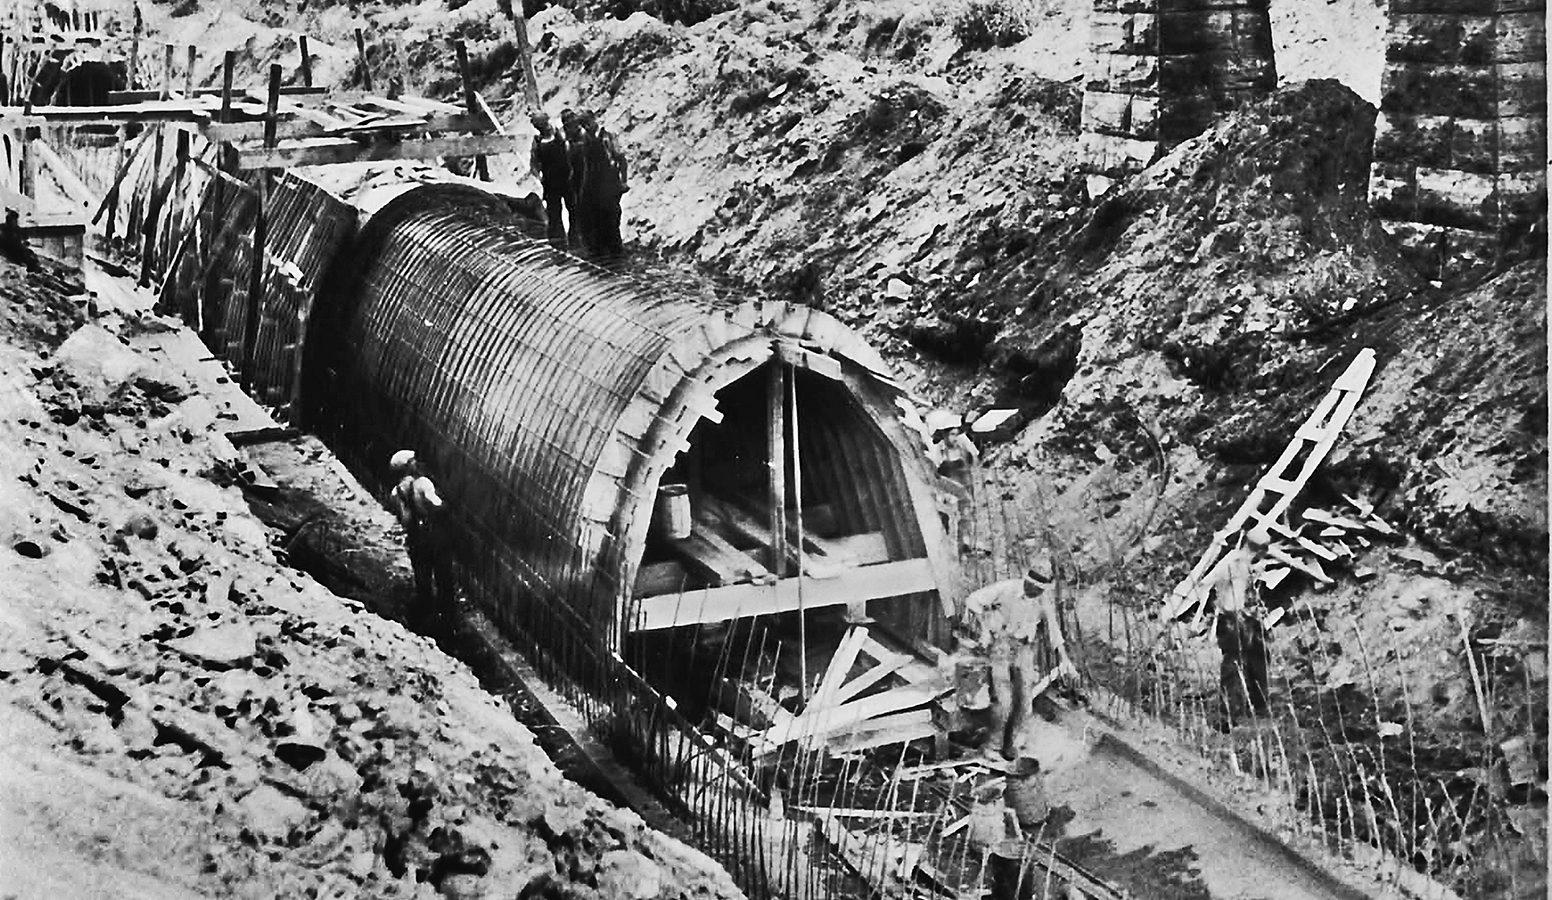 Original construction of the beltline pipe